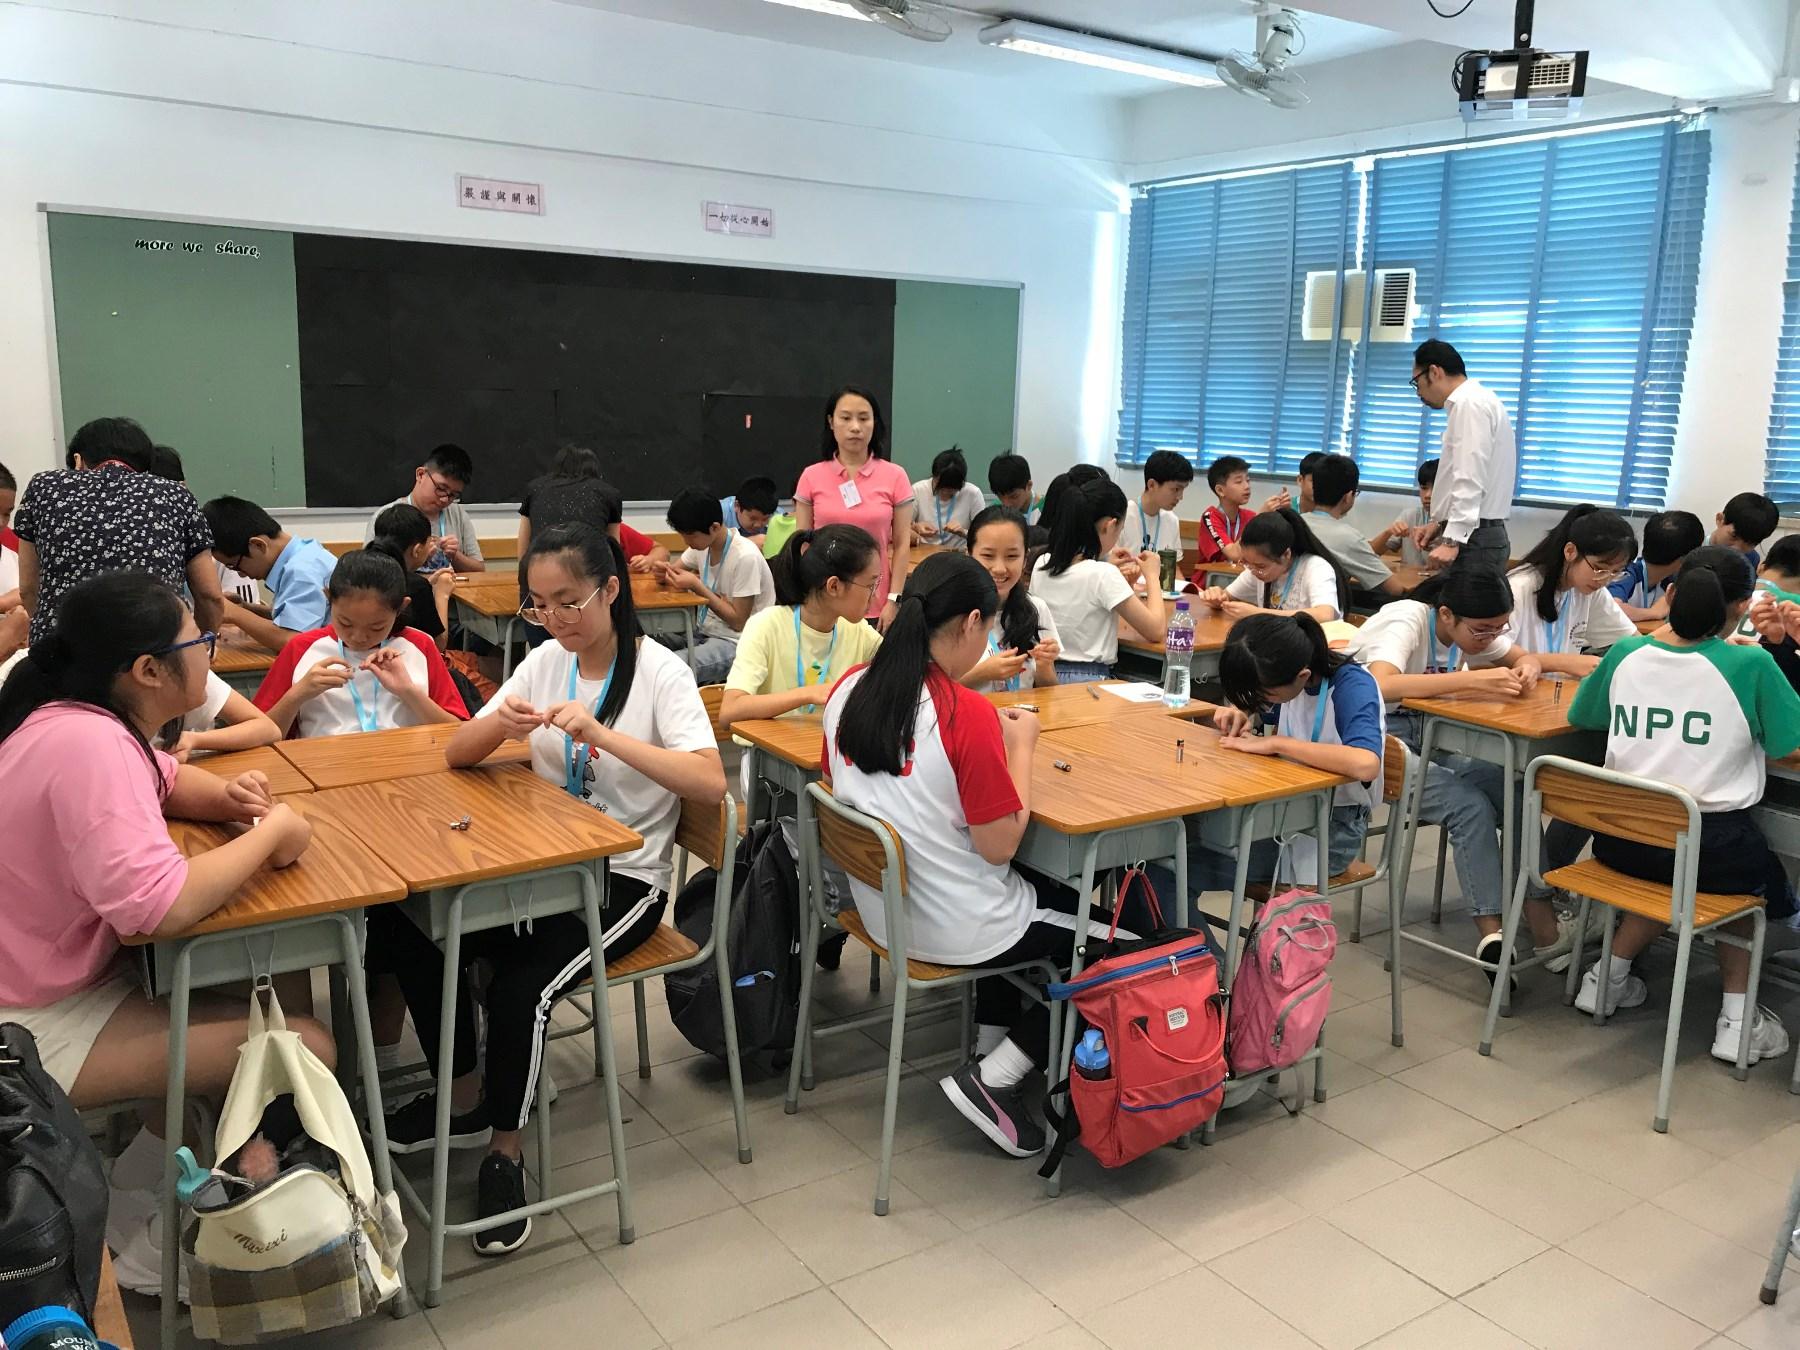 https://npc.edu.hk/sites/default/files/img_6857_2.jpg